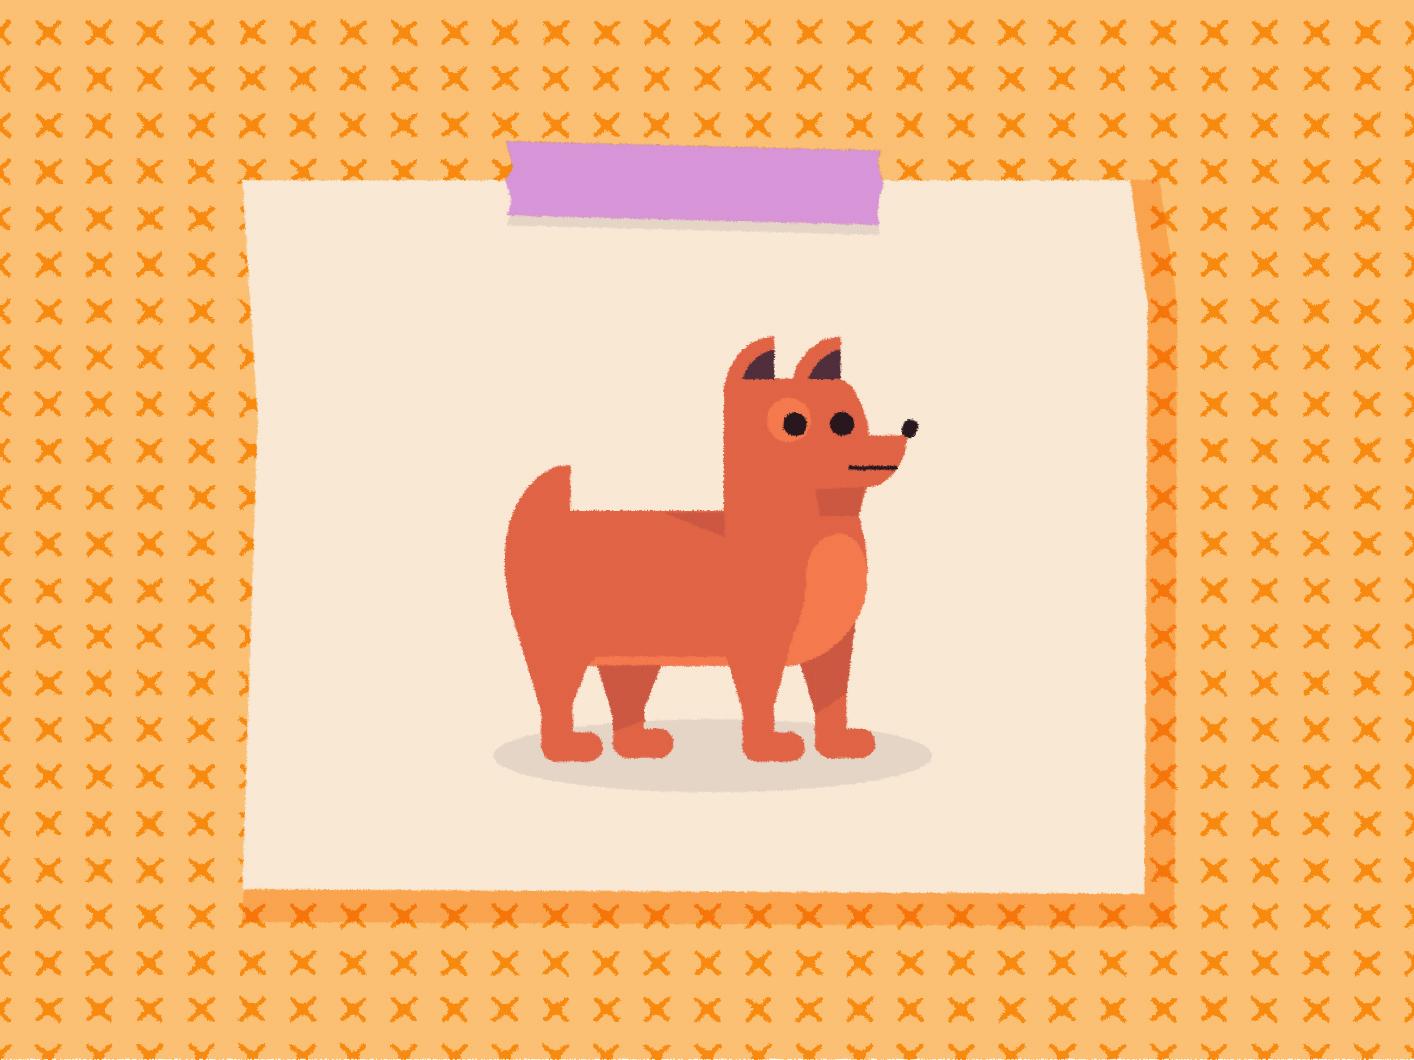 ( ͡°ᴥ ͡° ʋ) bark woof pet animal art character designs pattern vector dog art pup puppy dog character texture illustrator illustration